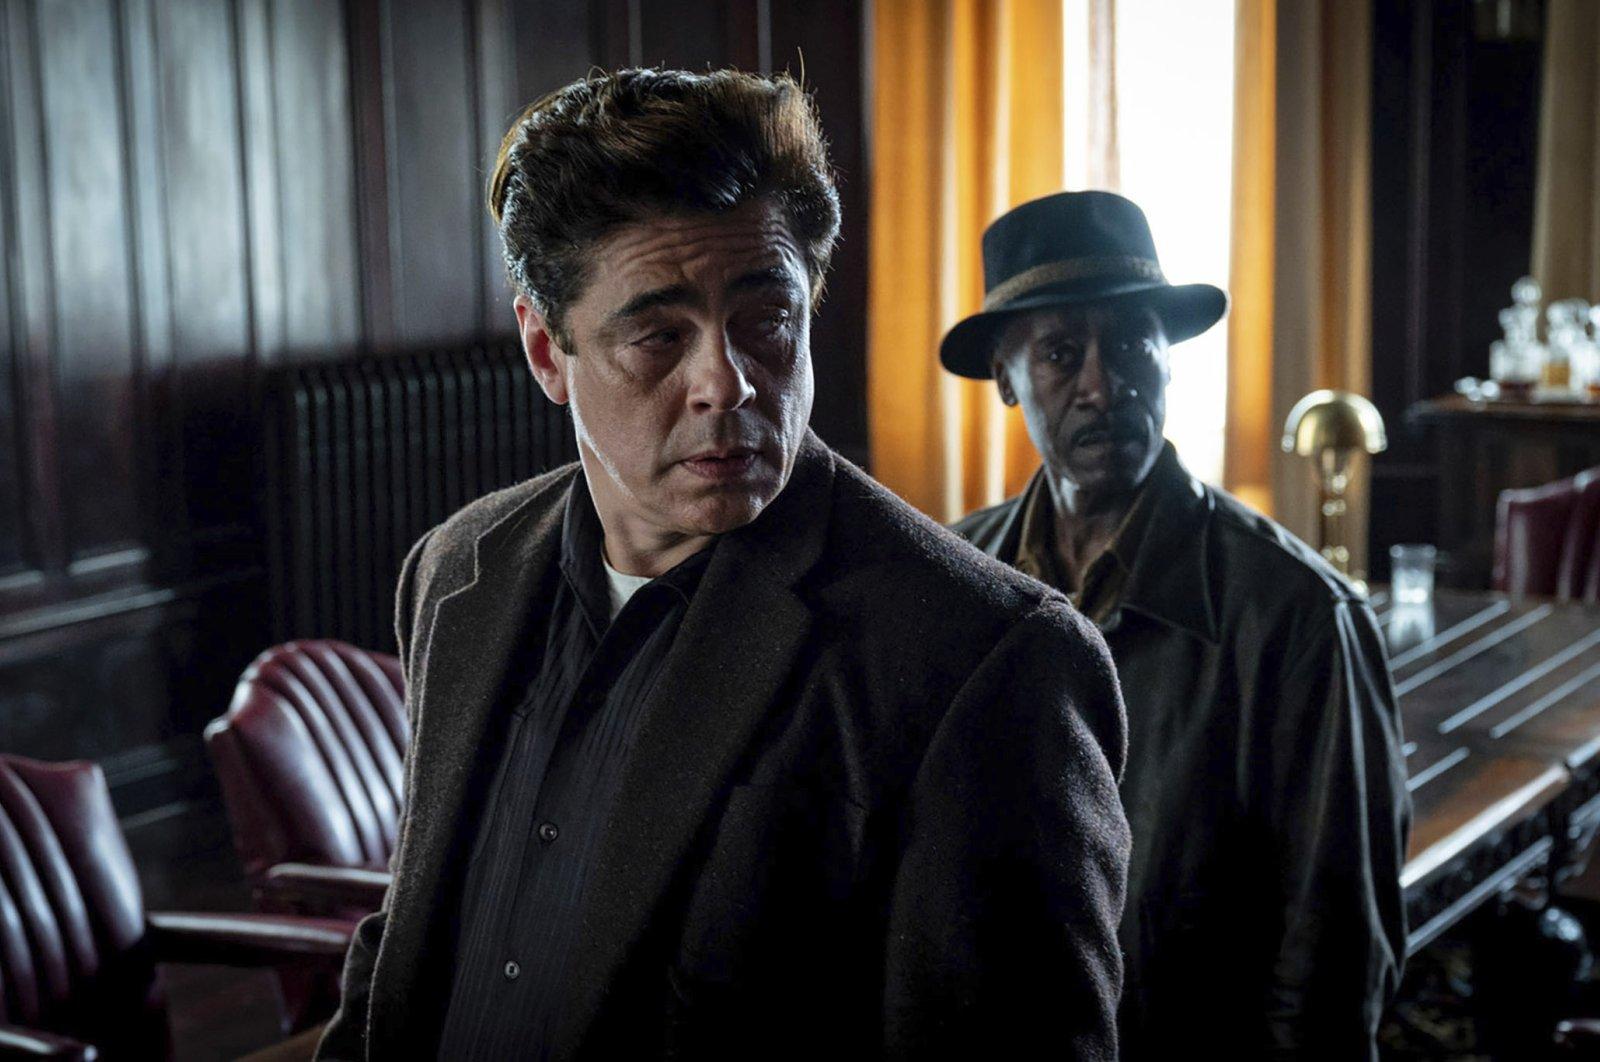 "Benicio del Toro (L), and Don Cheadle look off-camera in a scene from Steven Soderbergh's ""No Sudden Move,"" a film that will premiere as the centerpiece of the Tribeca Film Festival next month. (Warner Bros. Pictures via AP)"